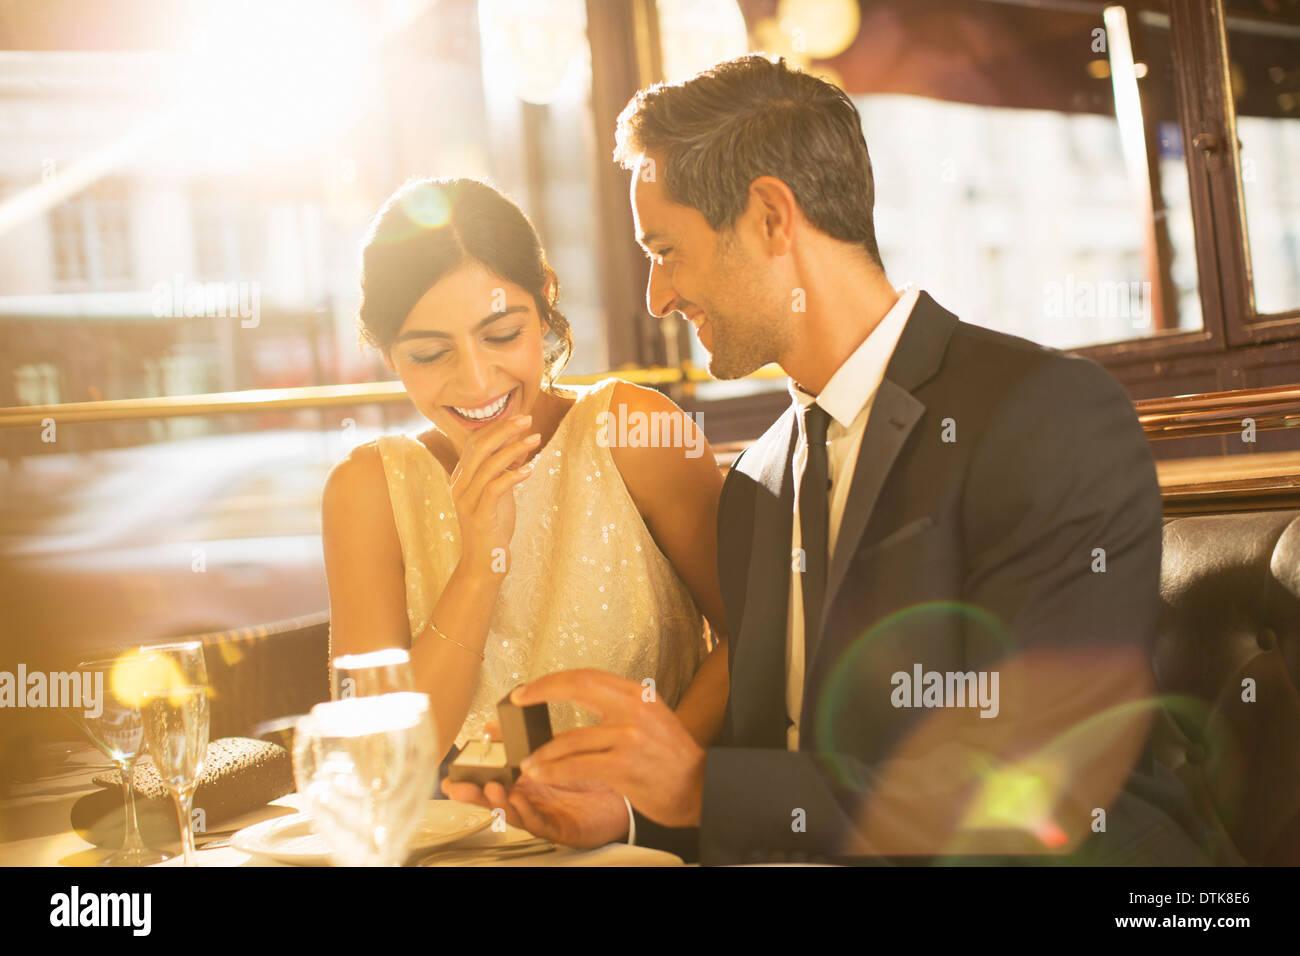 Man proposing to girlfriend in restaurant - Stock Image